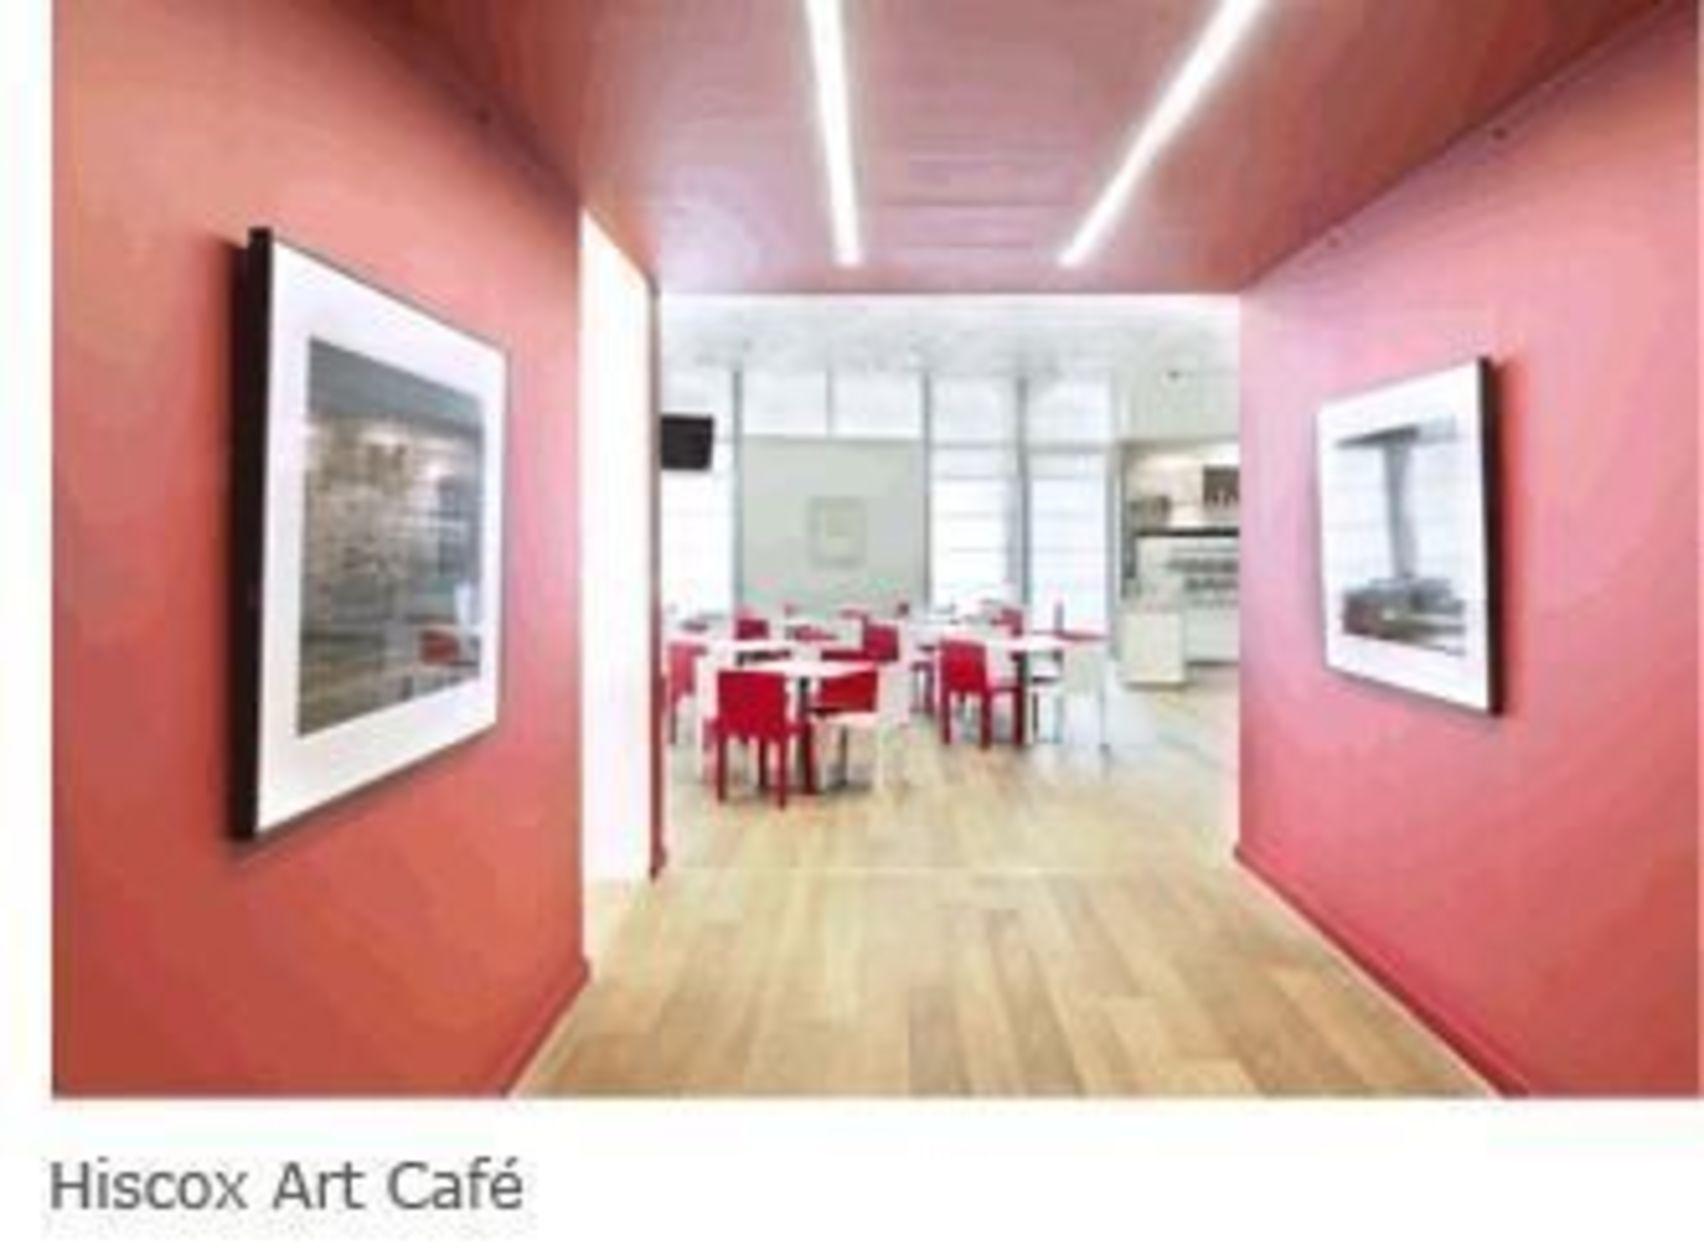 Hiscox Art Cafe, Art Cafe